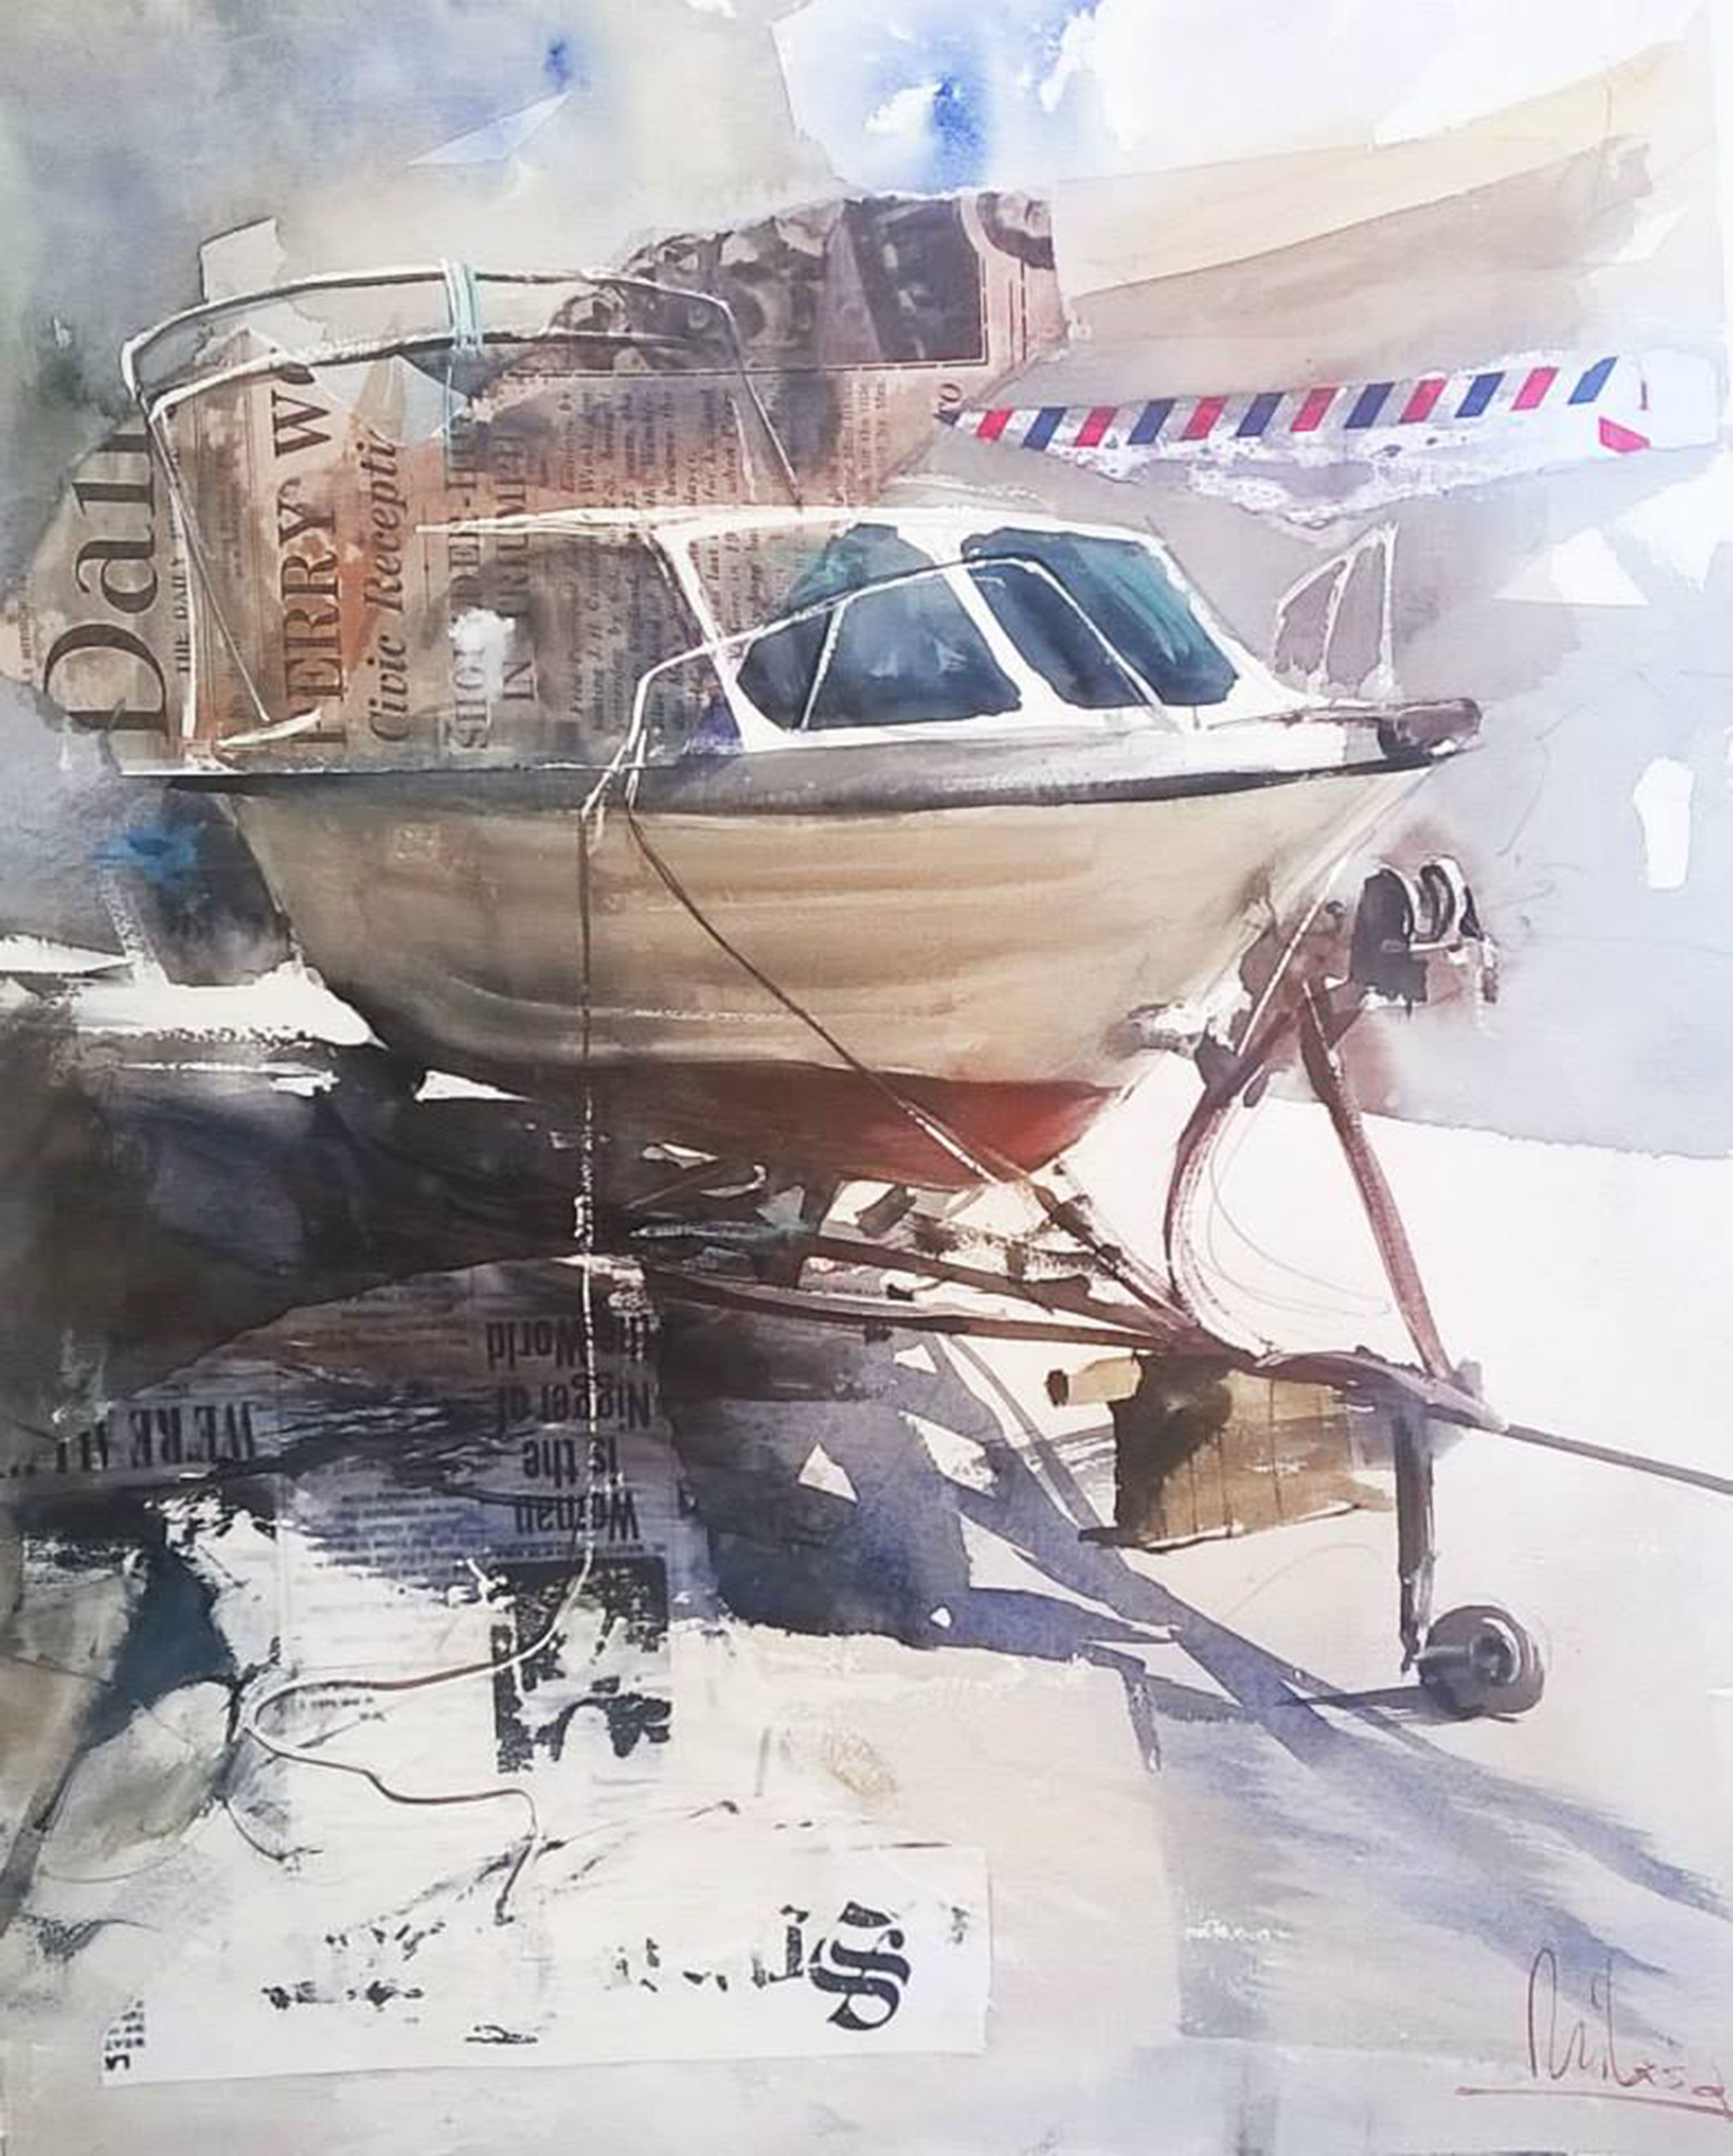 #WorldWatercolorGroup - watercolor by Dalibor Popovic Miksa of boat - #doodlewash